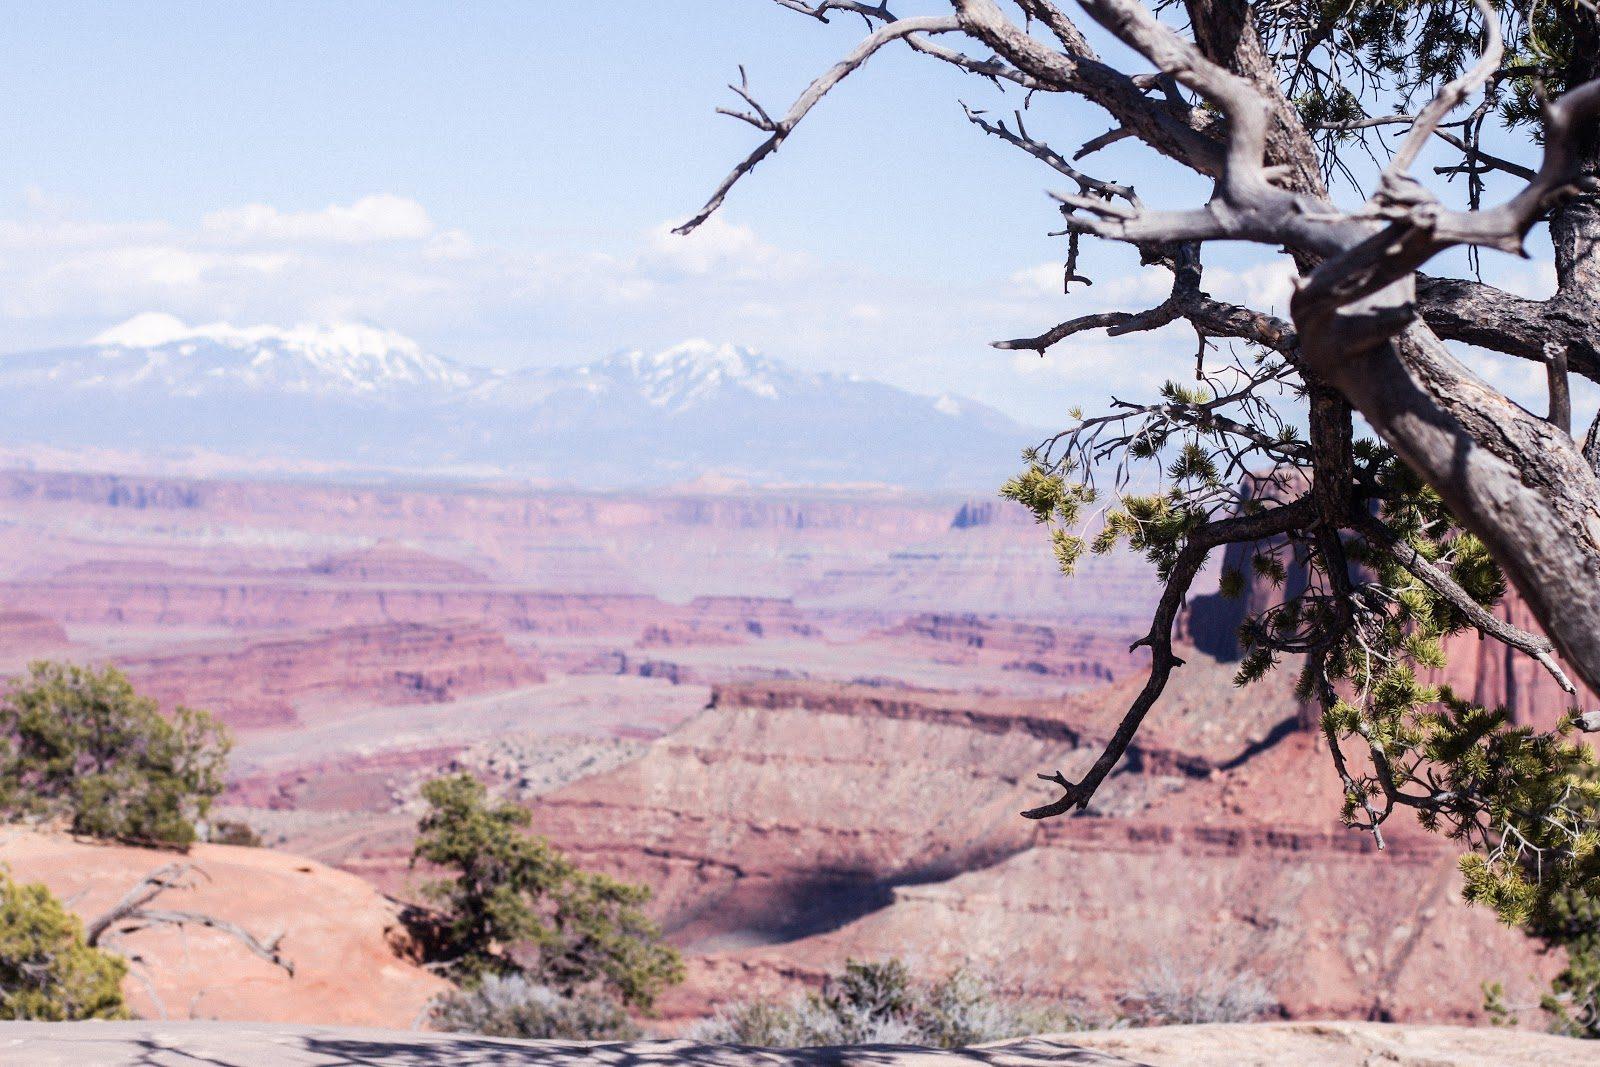 moab canyonlands usa roadtrip utah